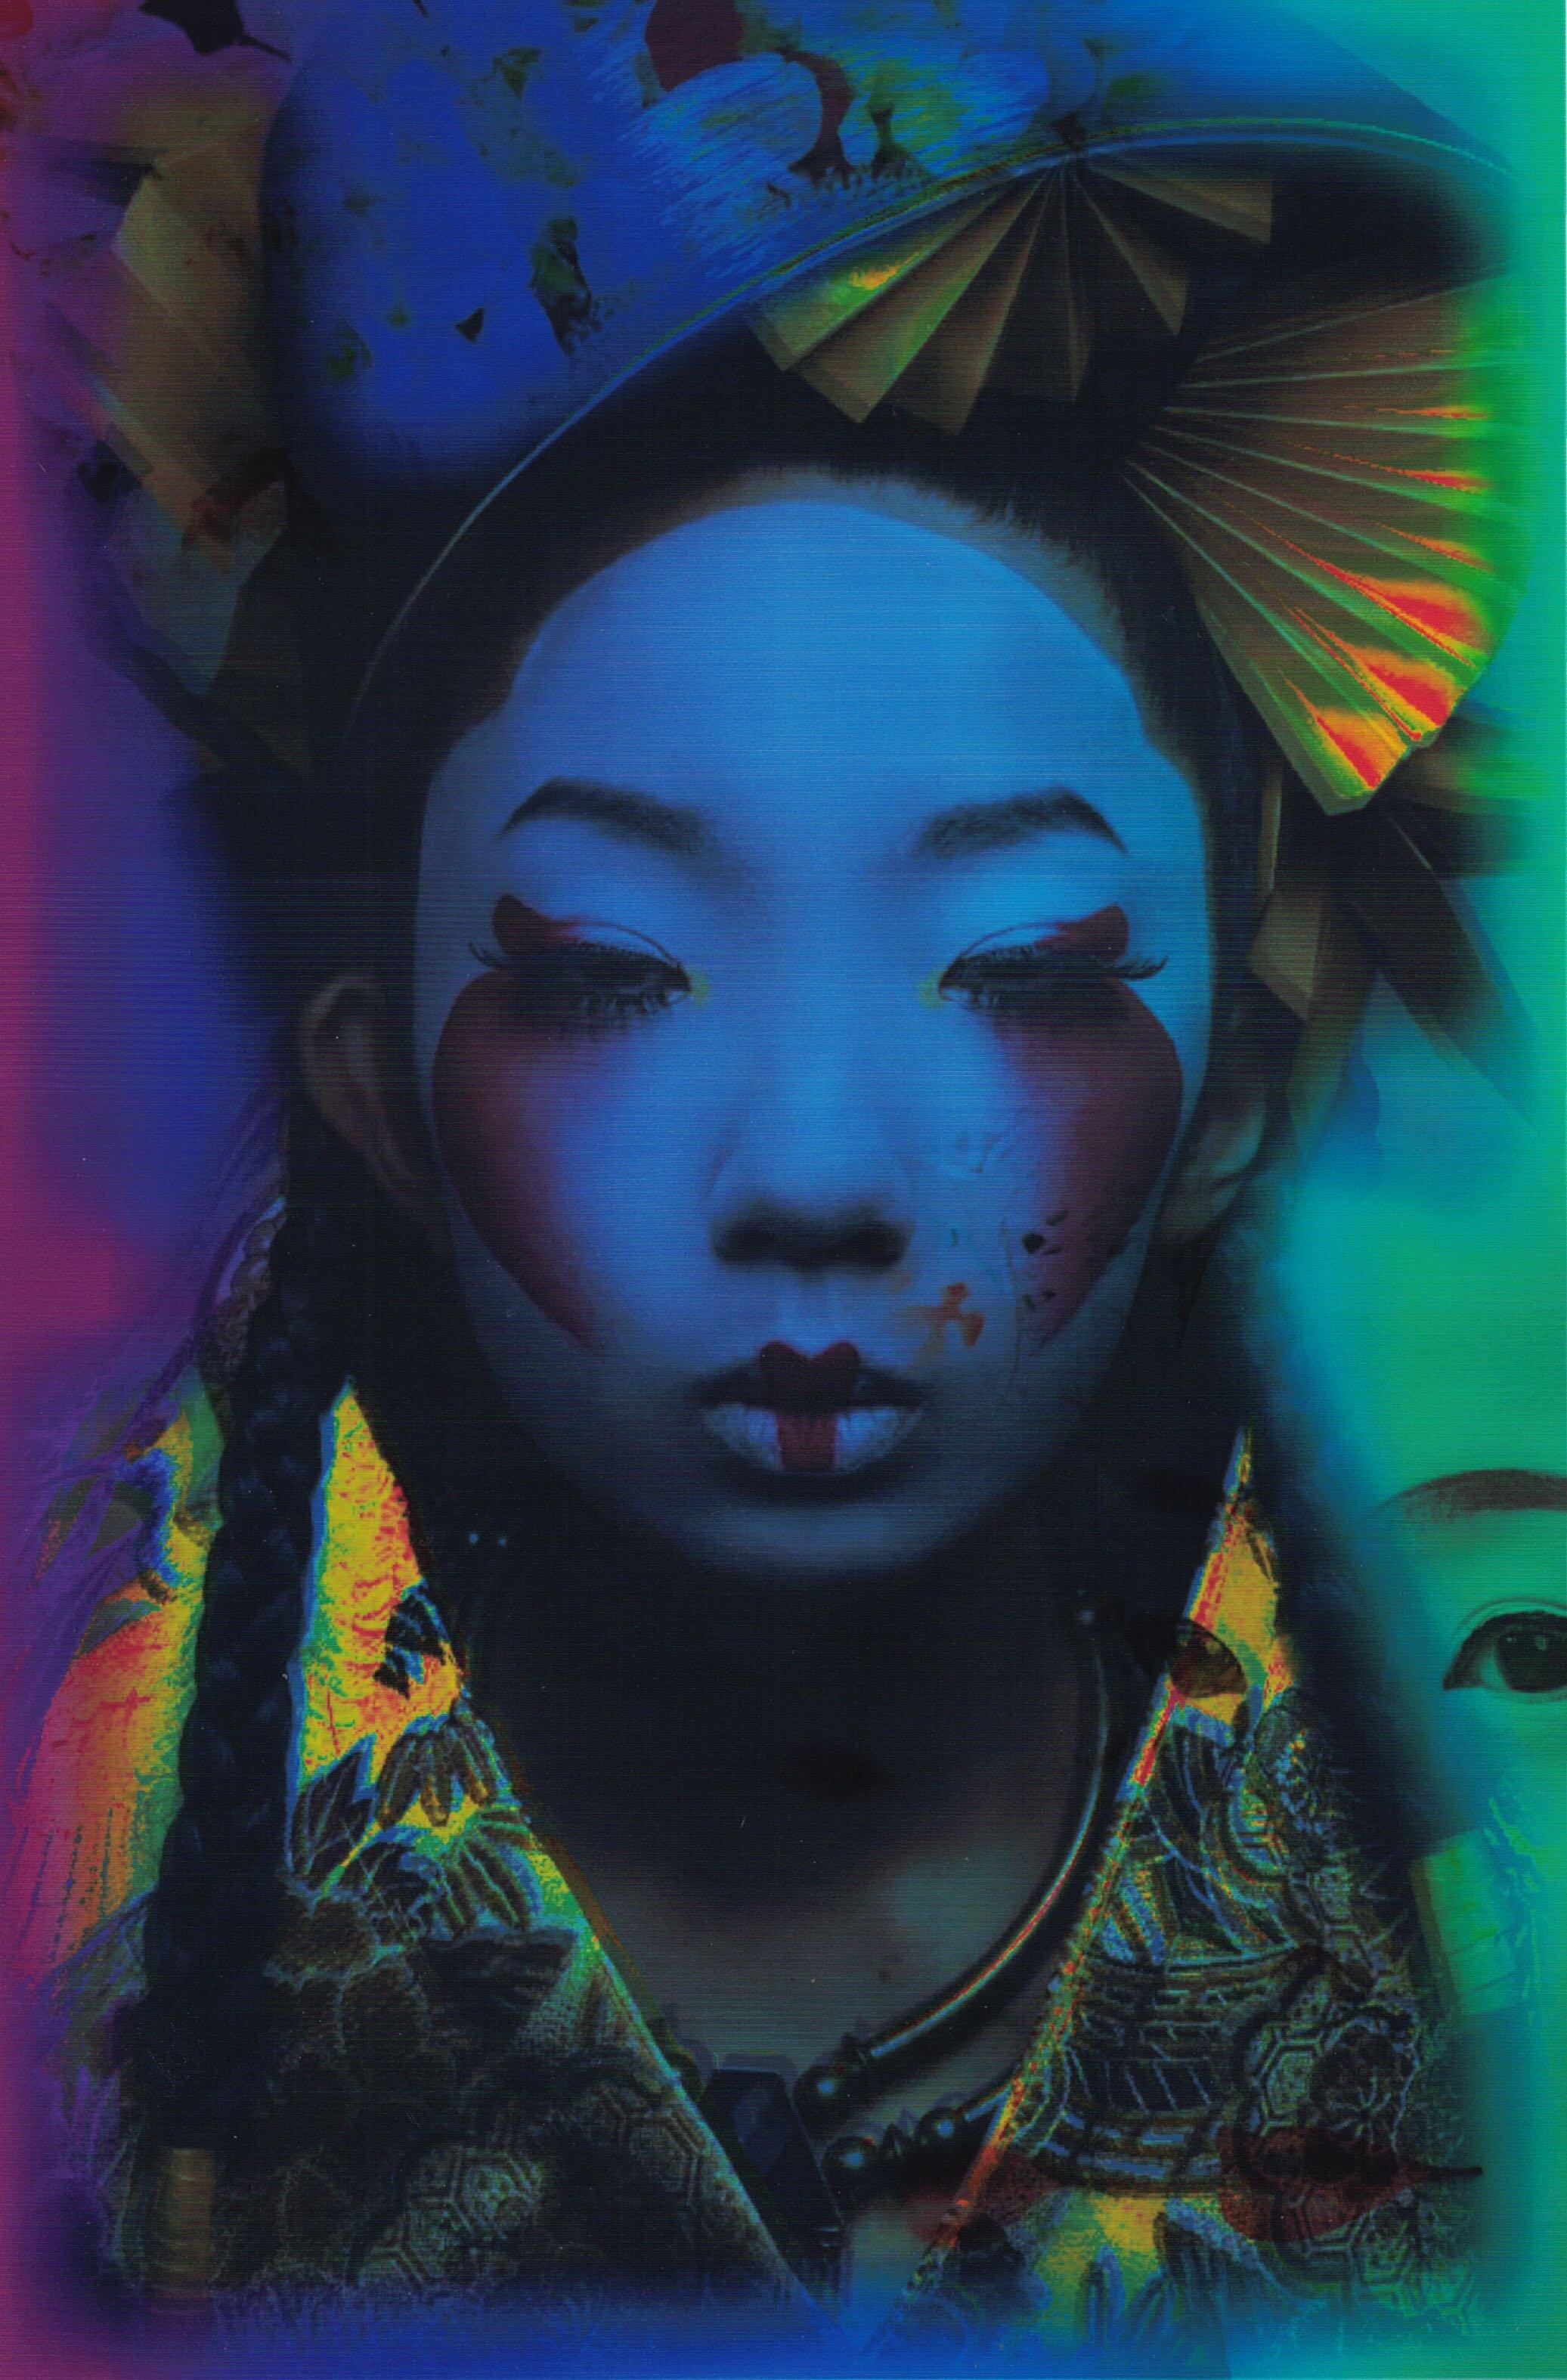 20496922-Anthony R. Whelihan_American Geisha_Watercolor Mixed media_14x17_$1400.00_2019.jpg